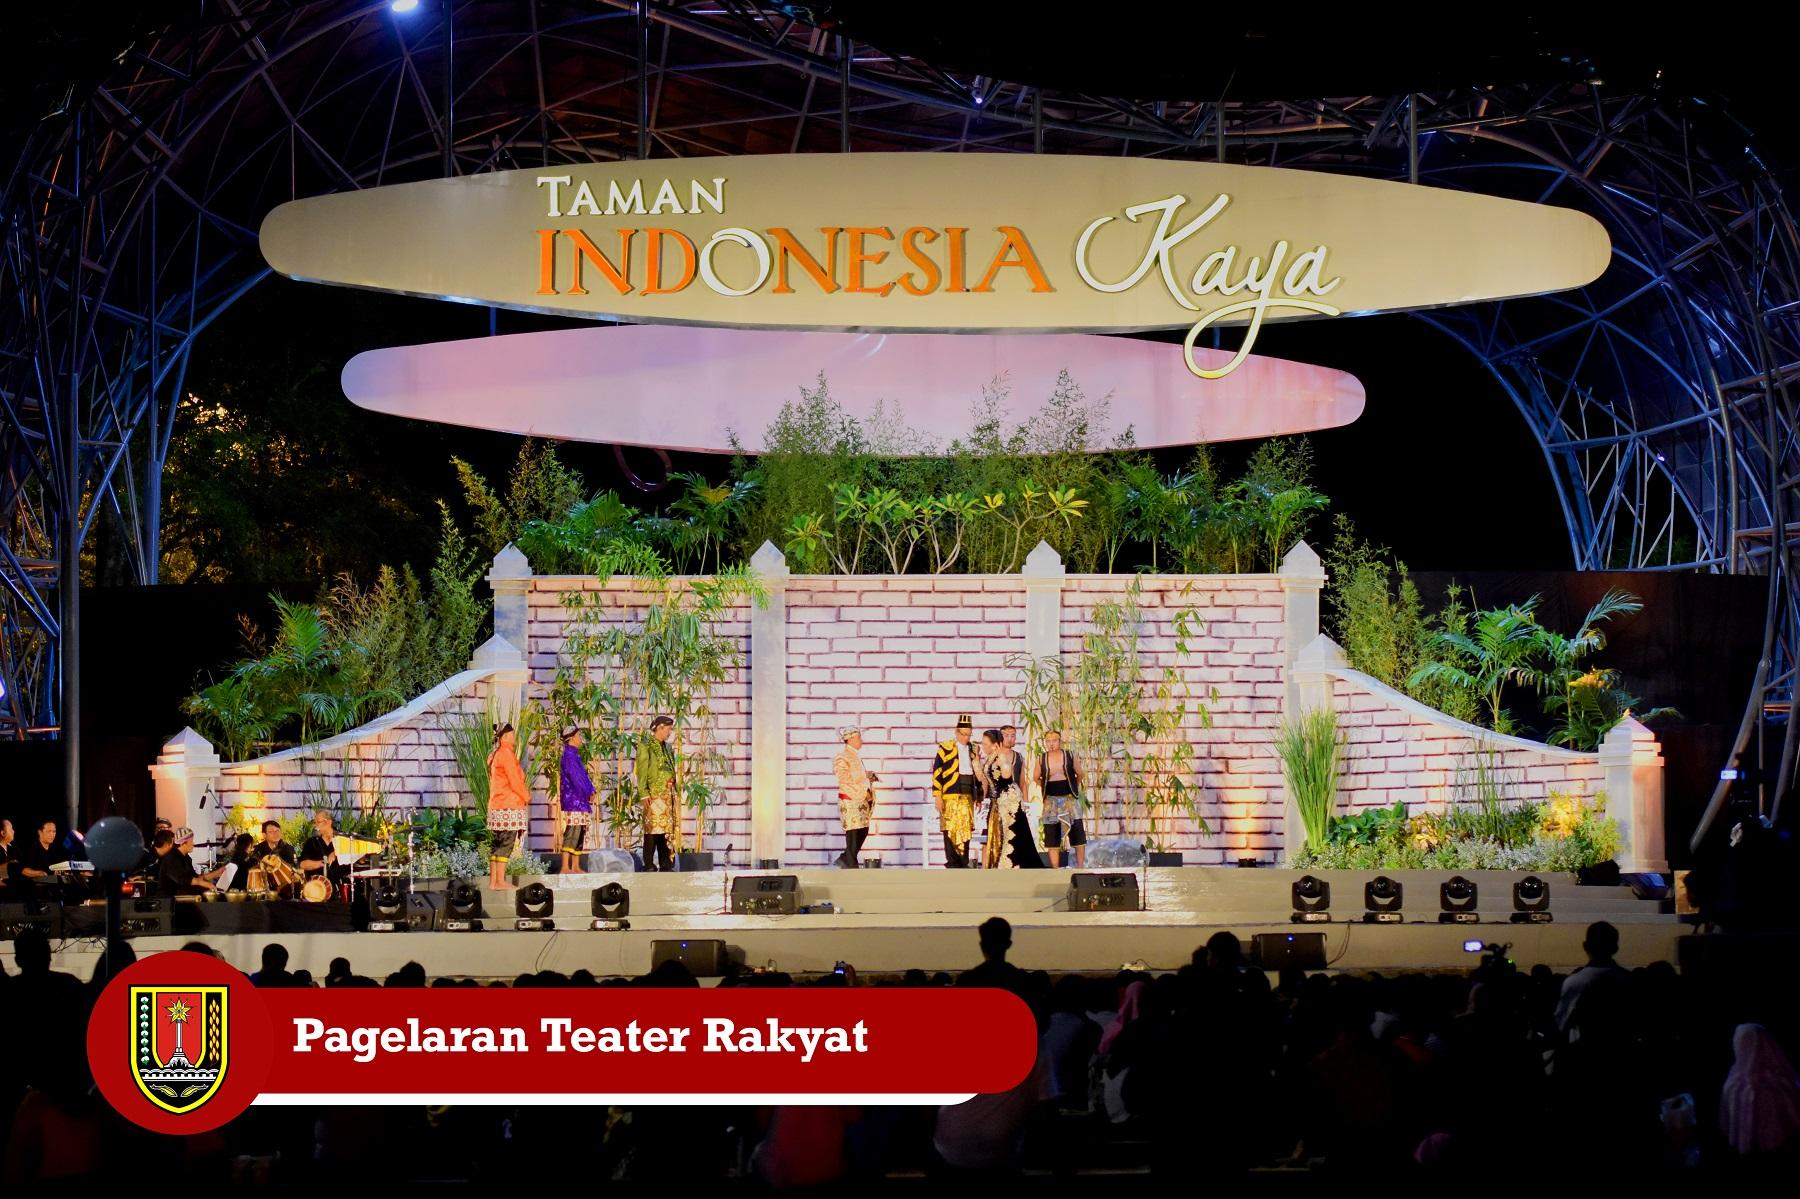 PAGELARAN TEATER RAKYAT (MISTERI SANG PANGERAN) TAMAN INDONESIA KAYA